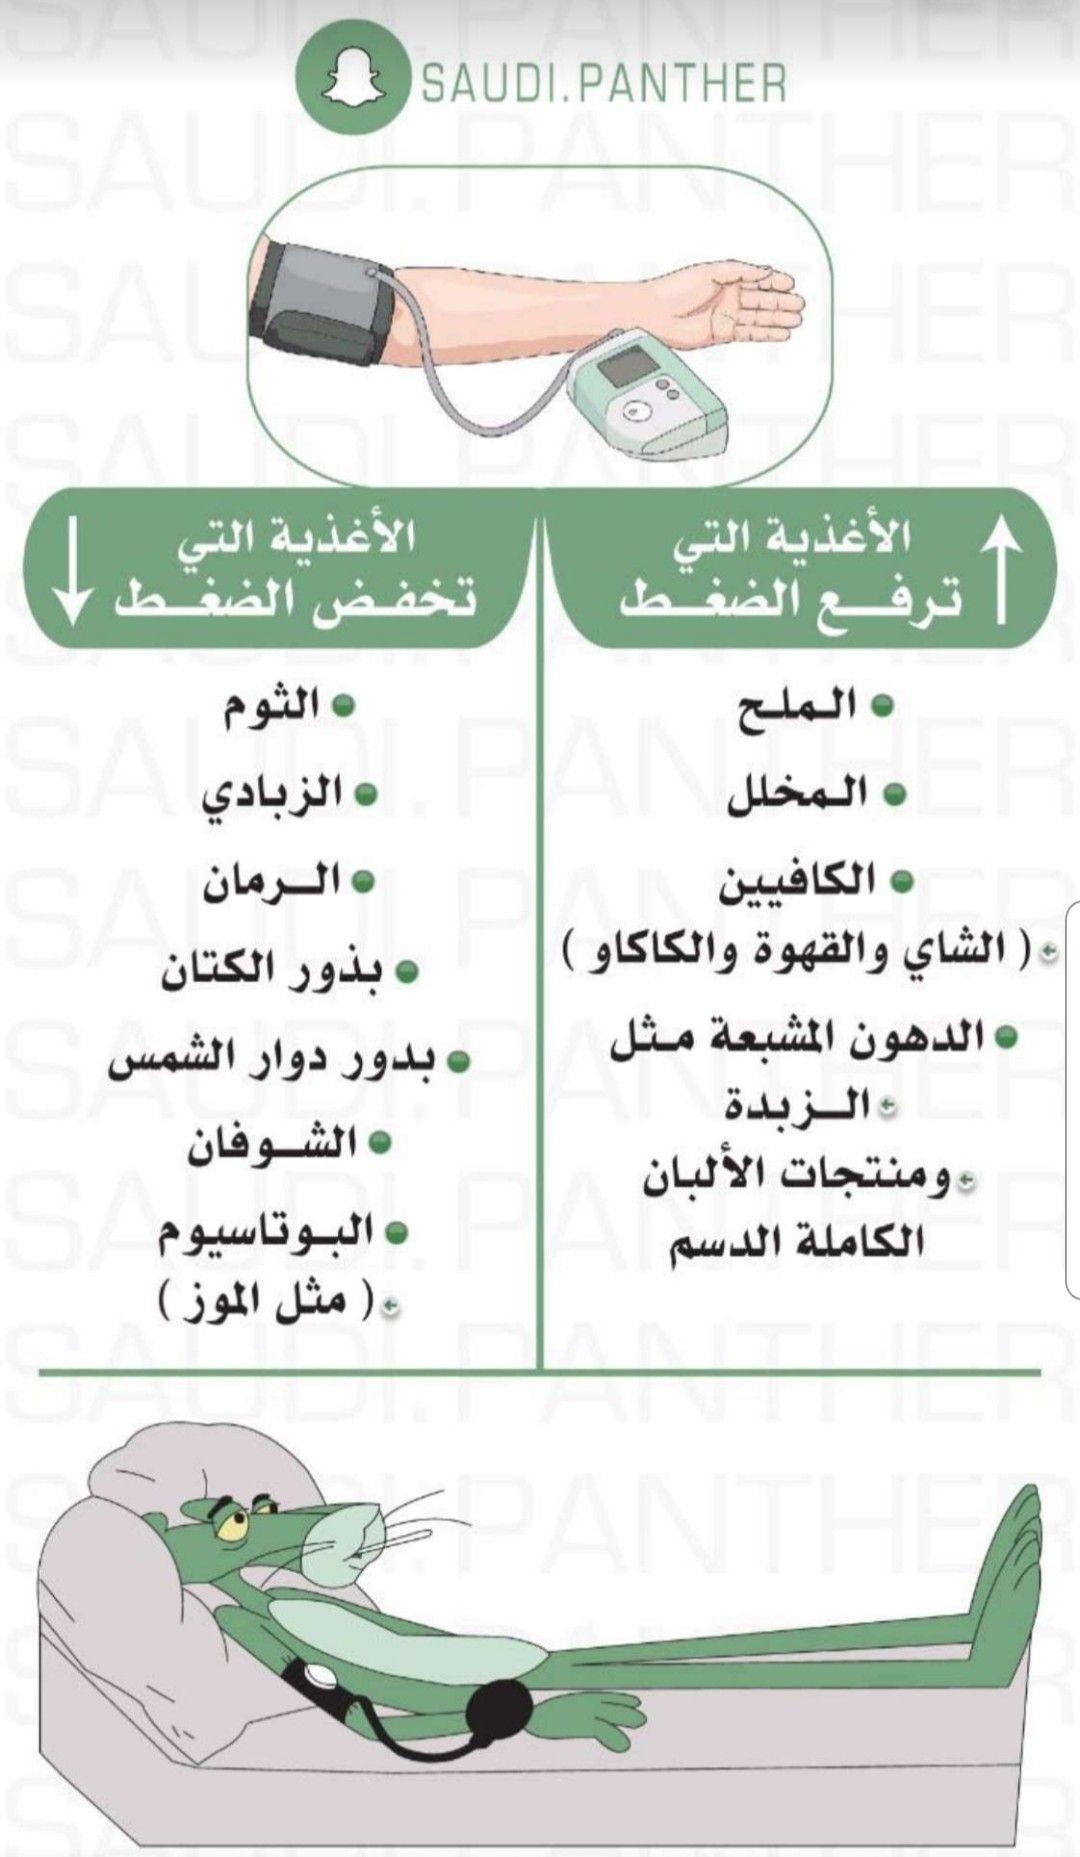 Pin By Zenaidi Omaima On شموخ Health And Wellness Center Health Facts Health Facts Fitness